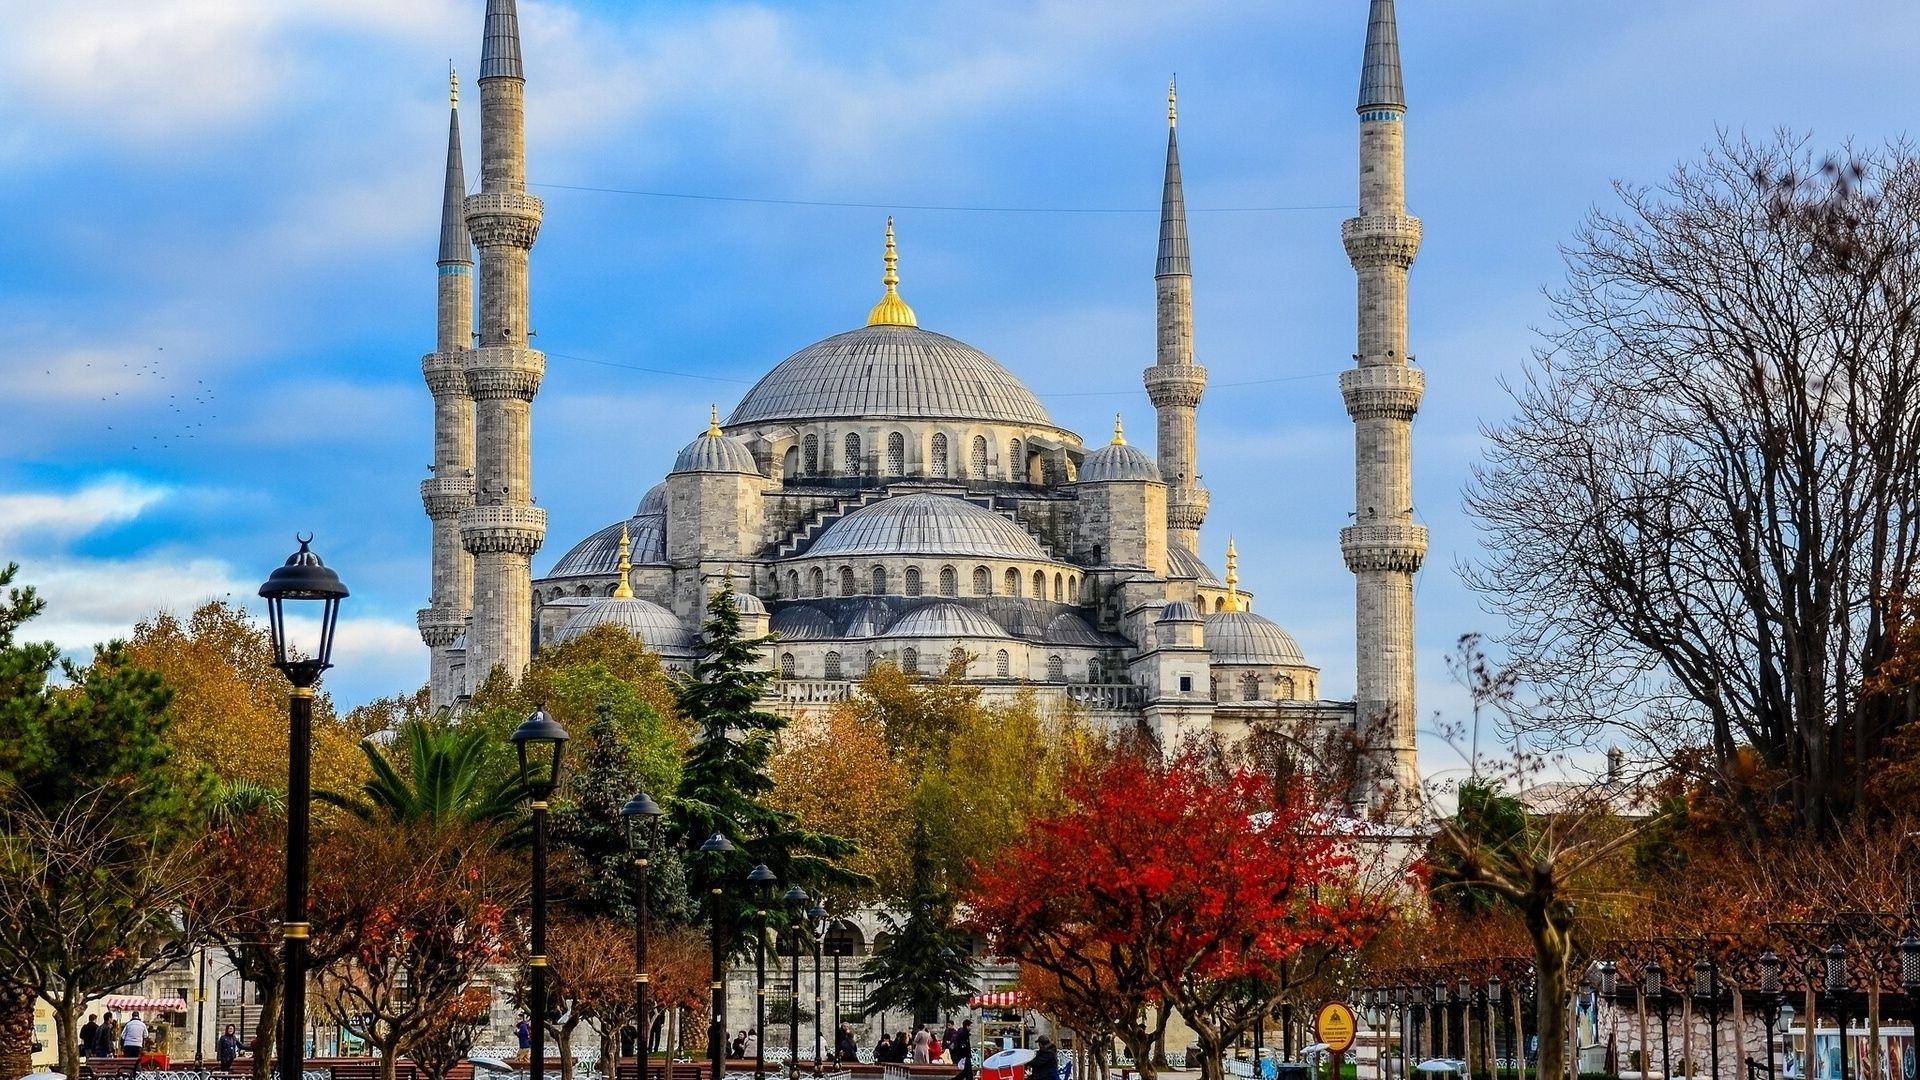 Hagia Sophia Wallpapers Jpg 1920 1080 Hagia Sophia Istanbul Mekkah